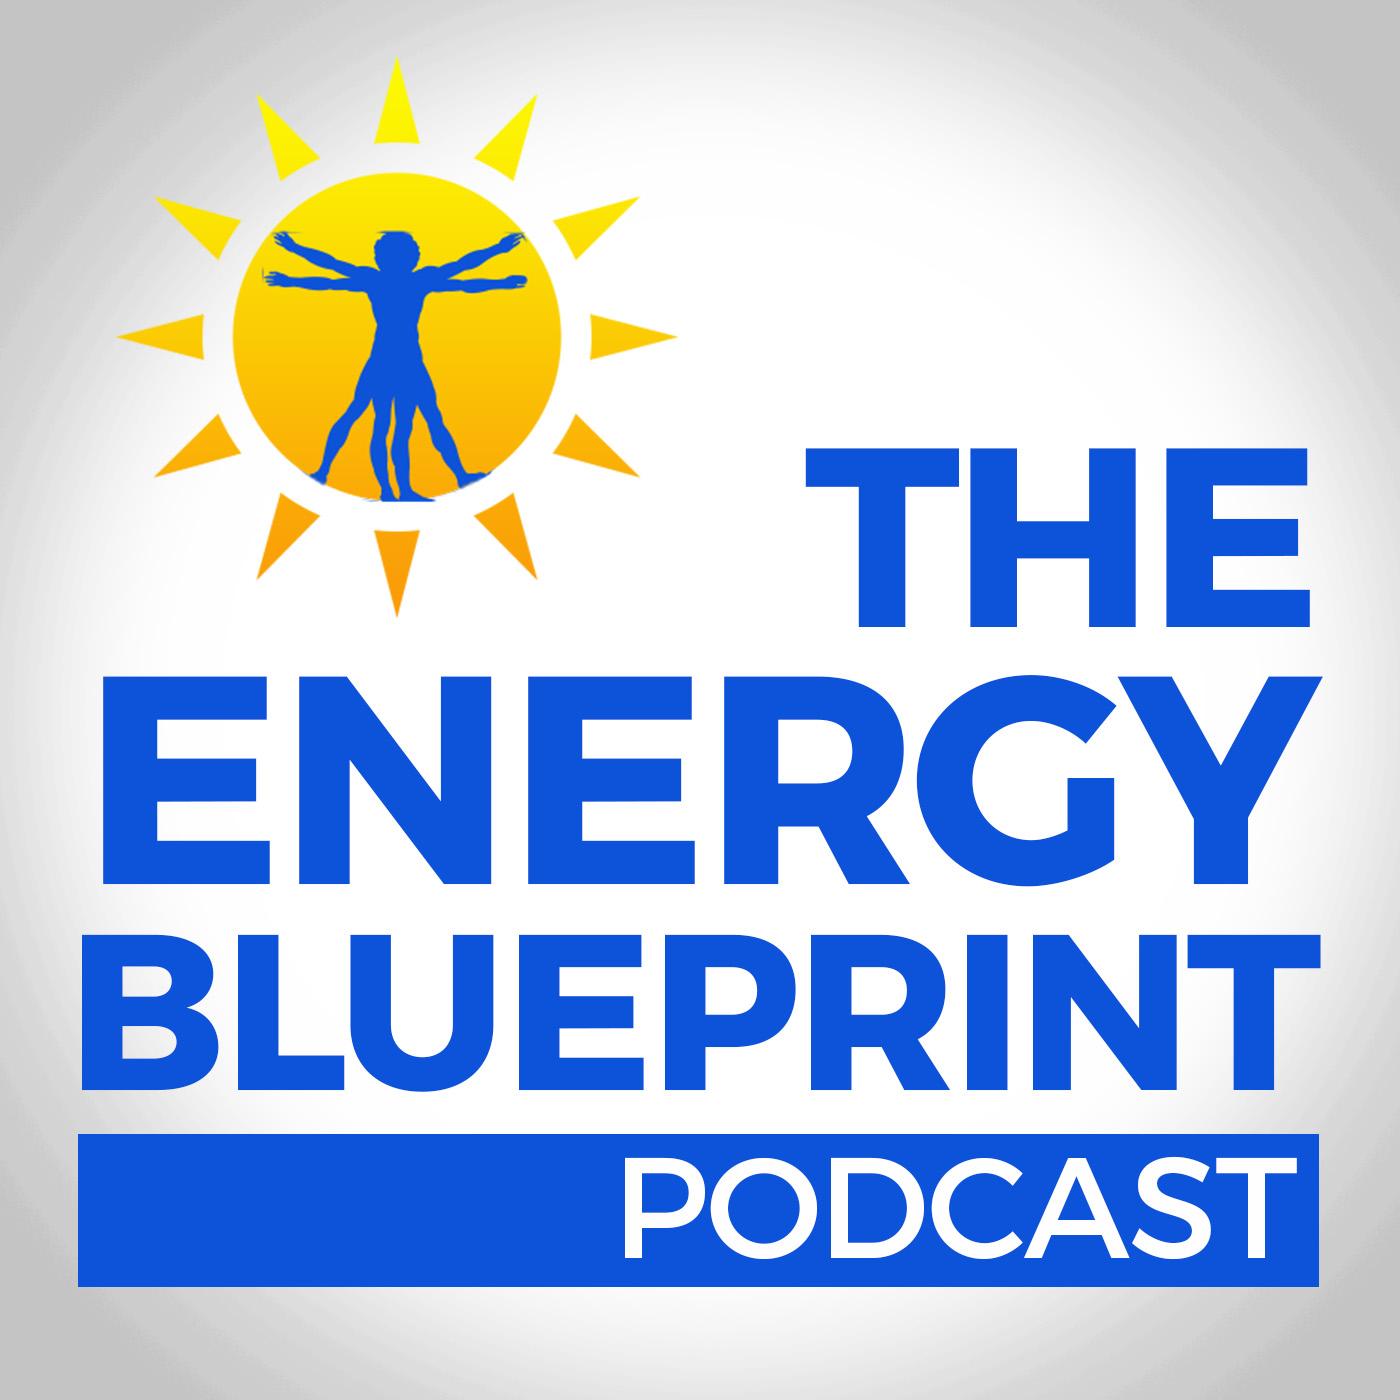 The Energy Blueprint Podcast show art